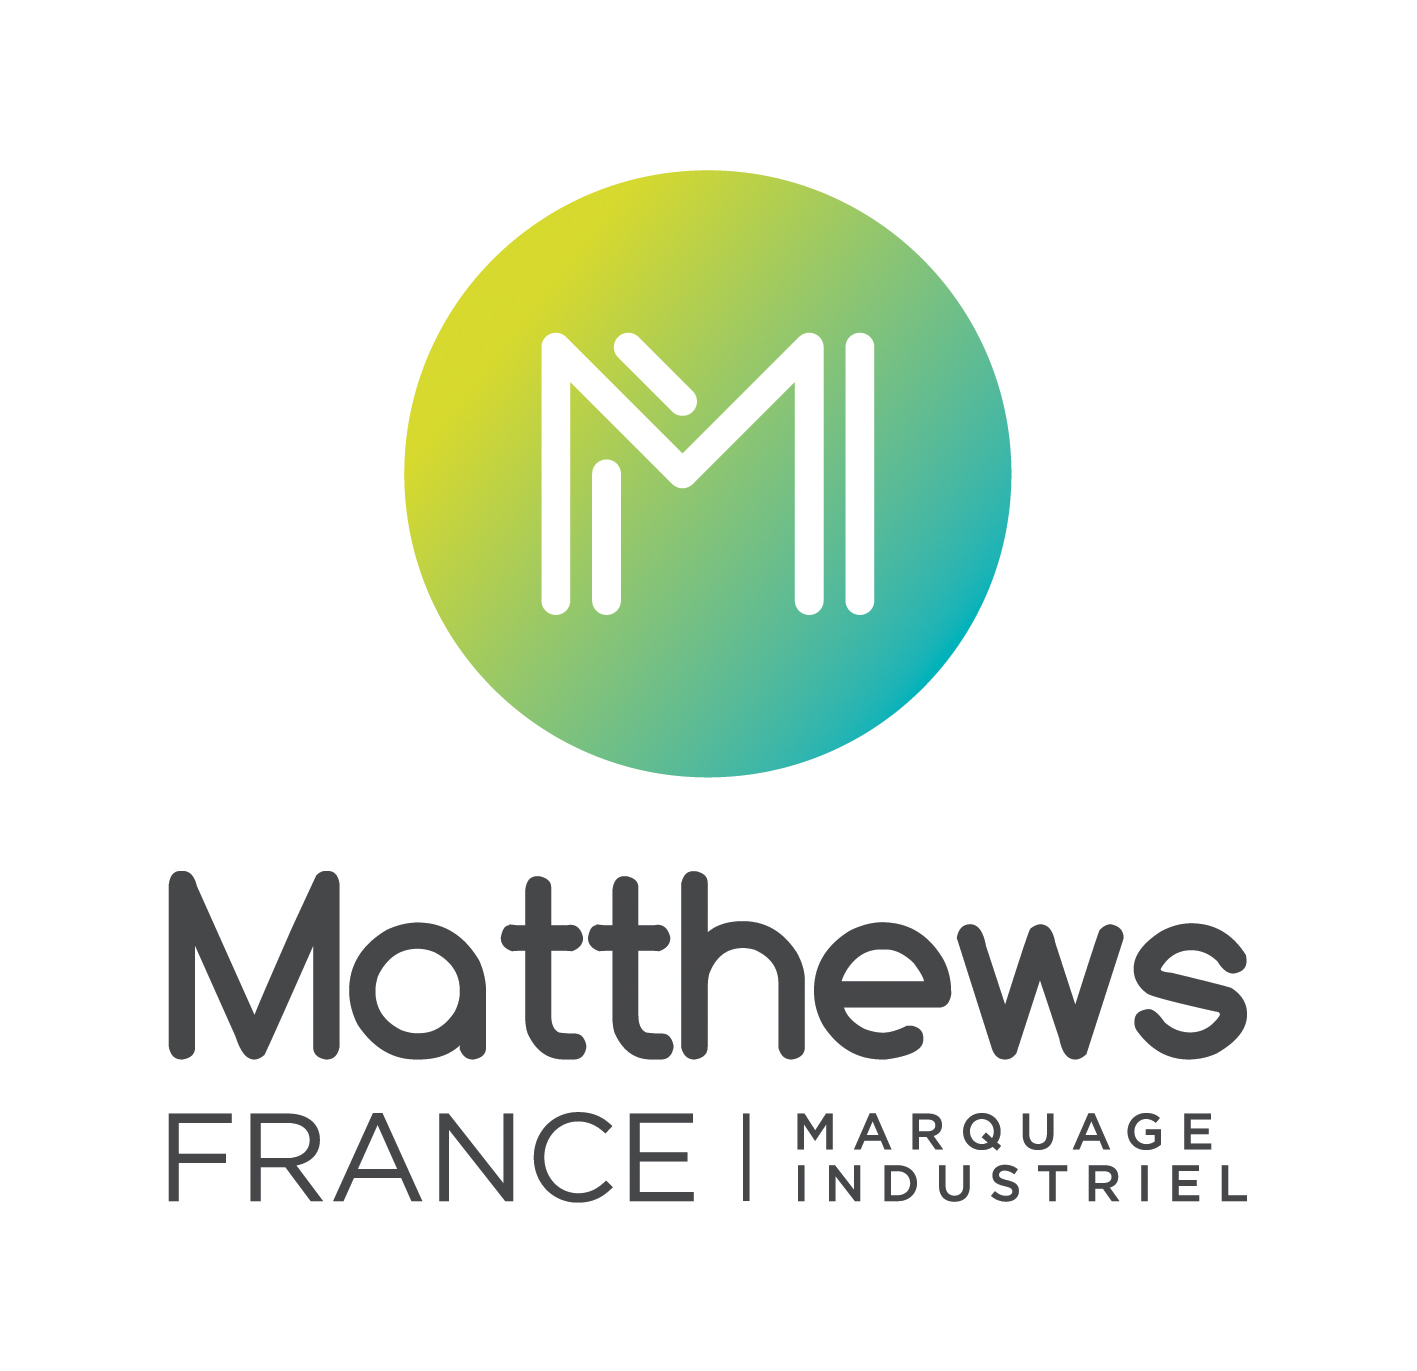 MATTHEWS France